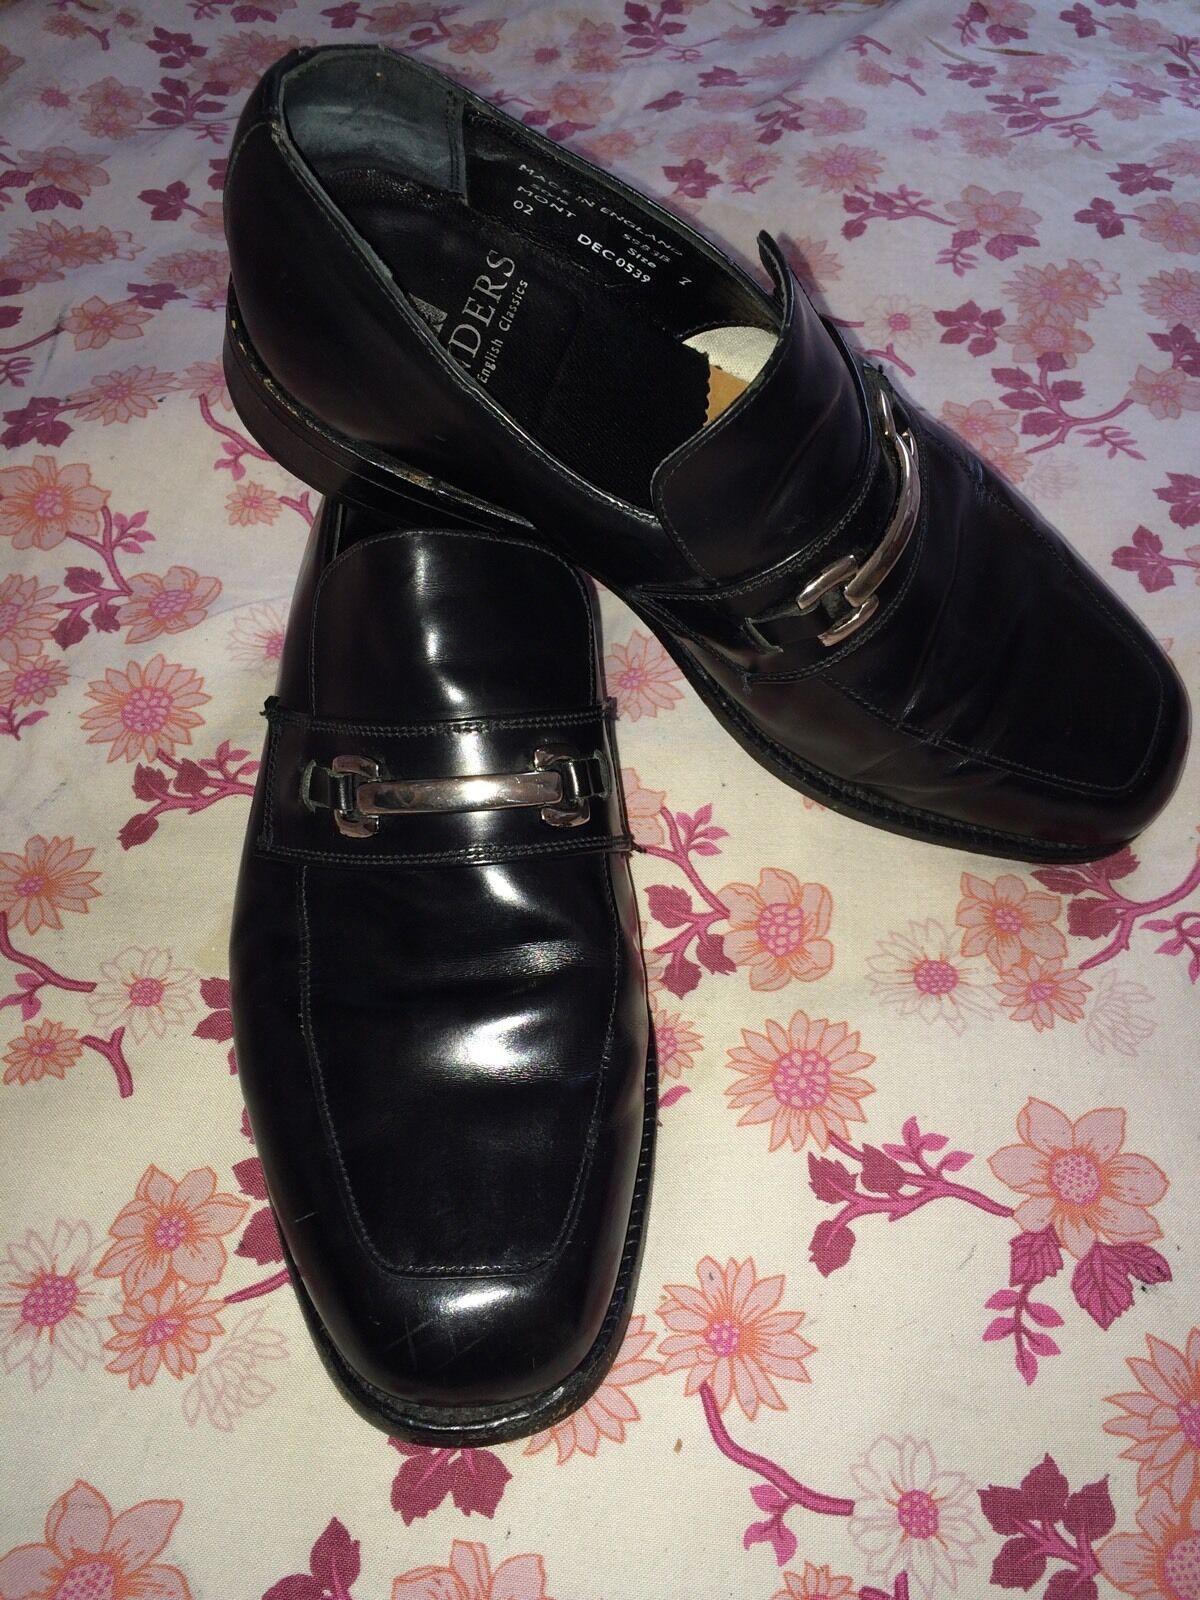 Sanders Genuine Leder Modern Modern Leder English Classics Schuhe Uk 7, Eu 41 02c4a2